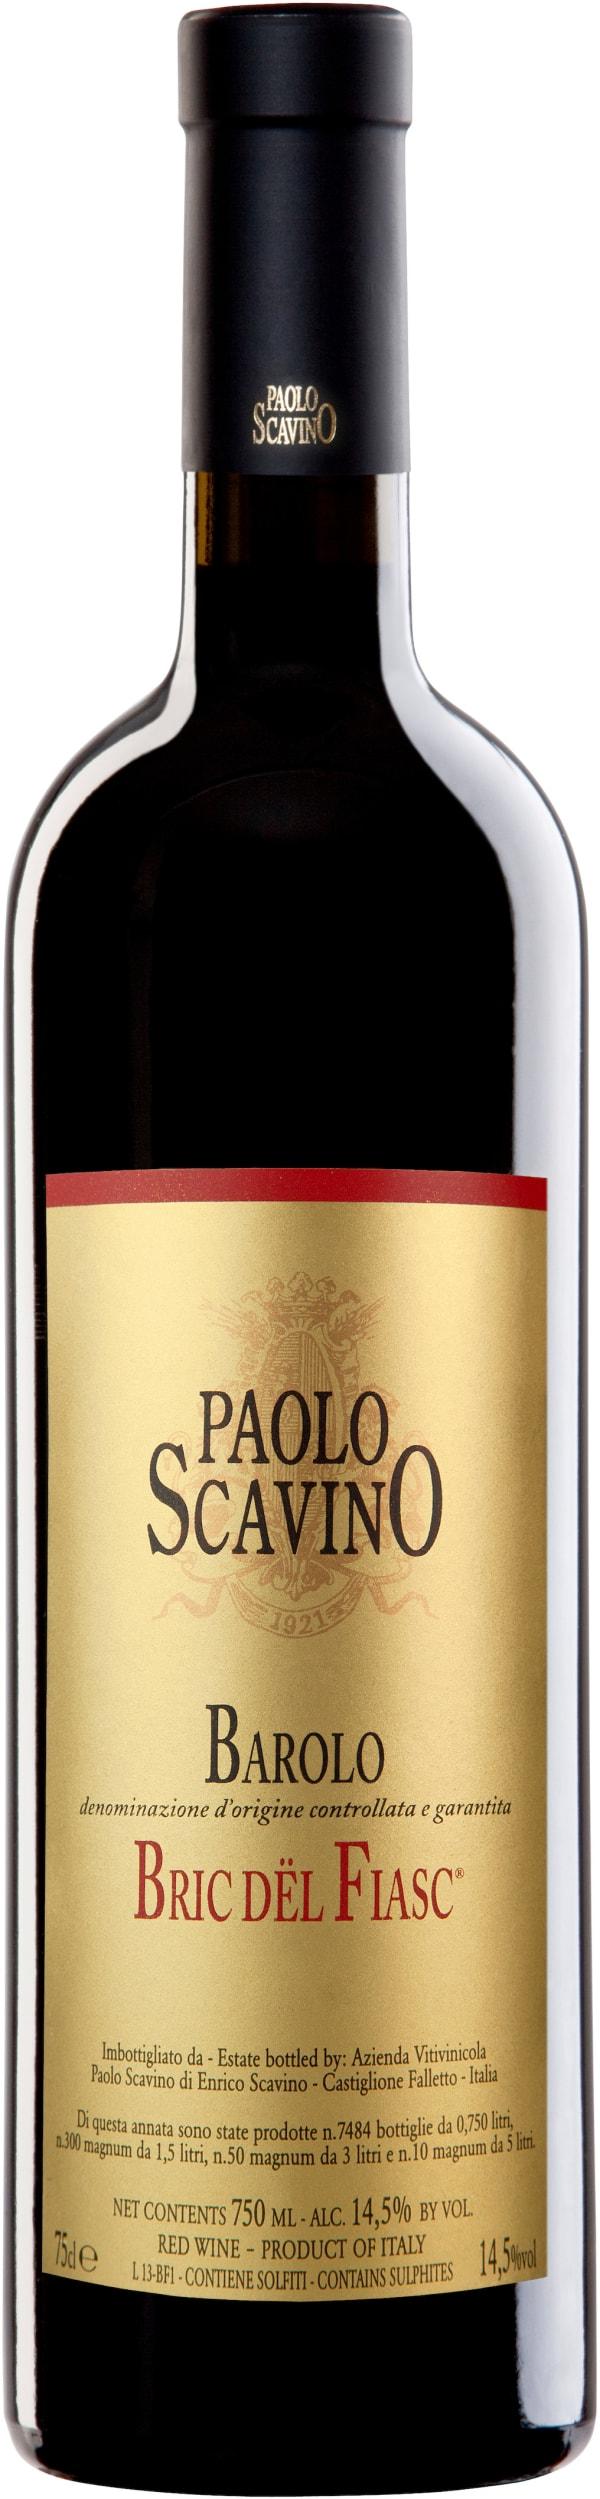 Paolo Scavino Barolo Bric dël Fiasc 2015